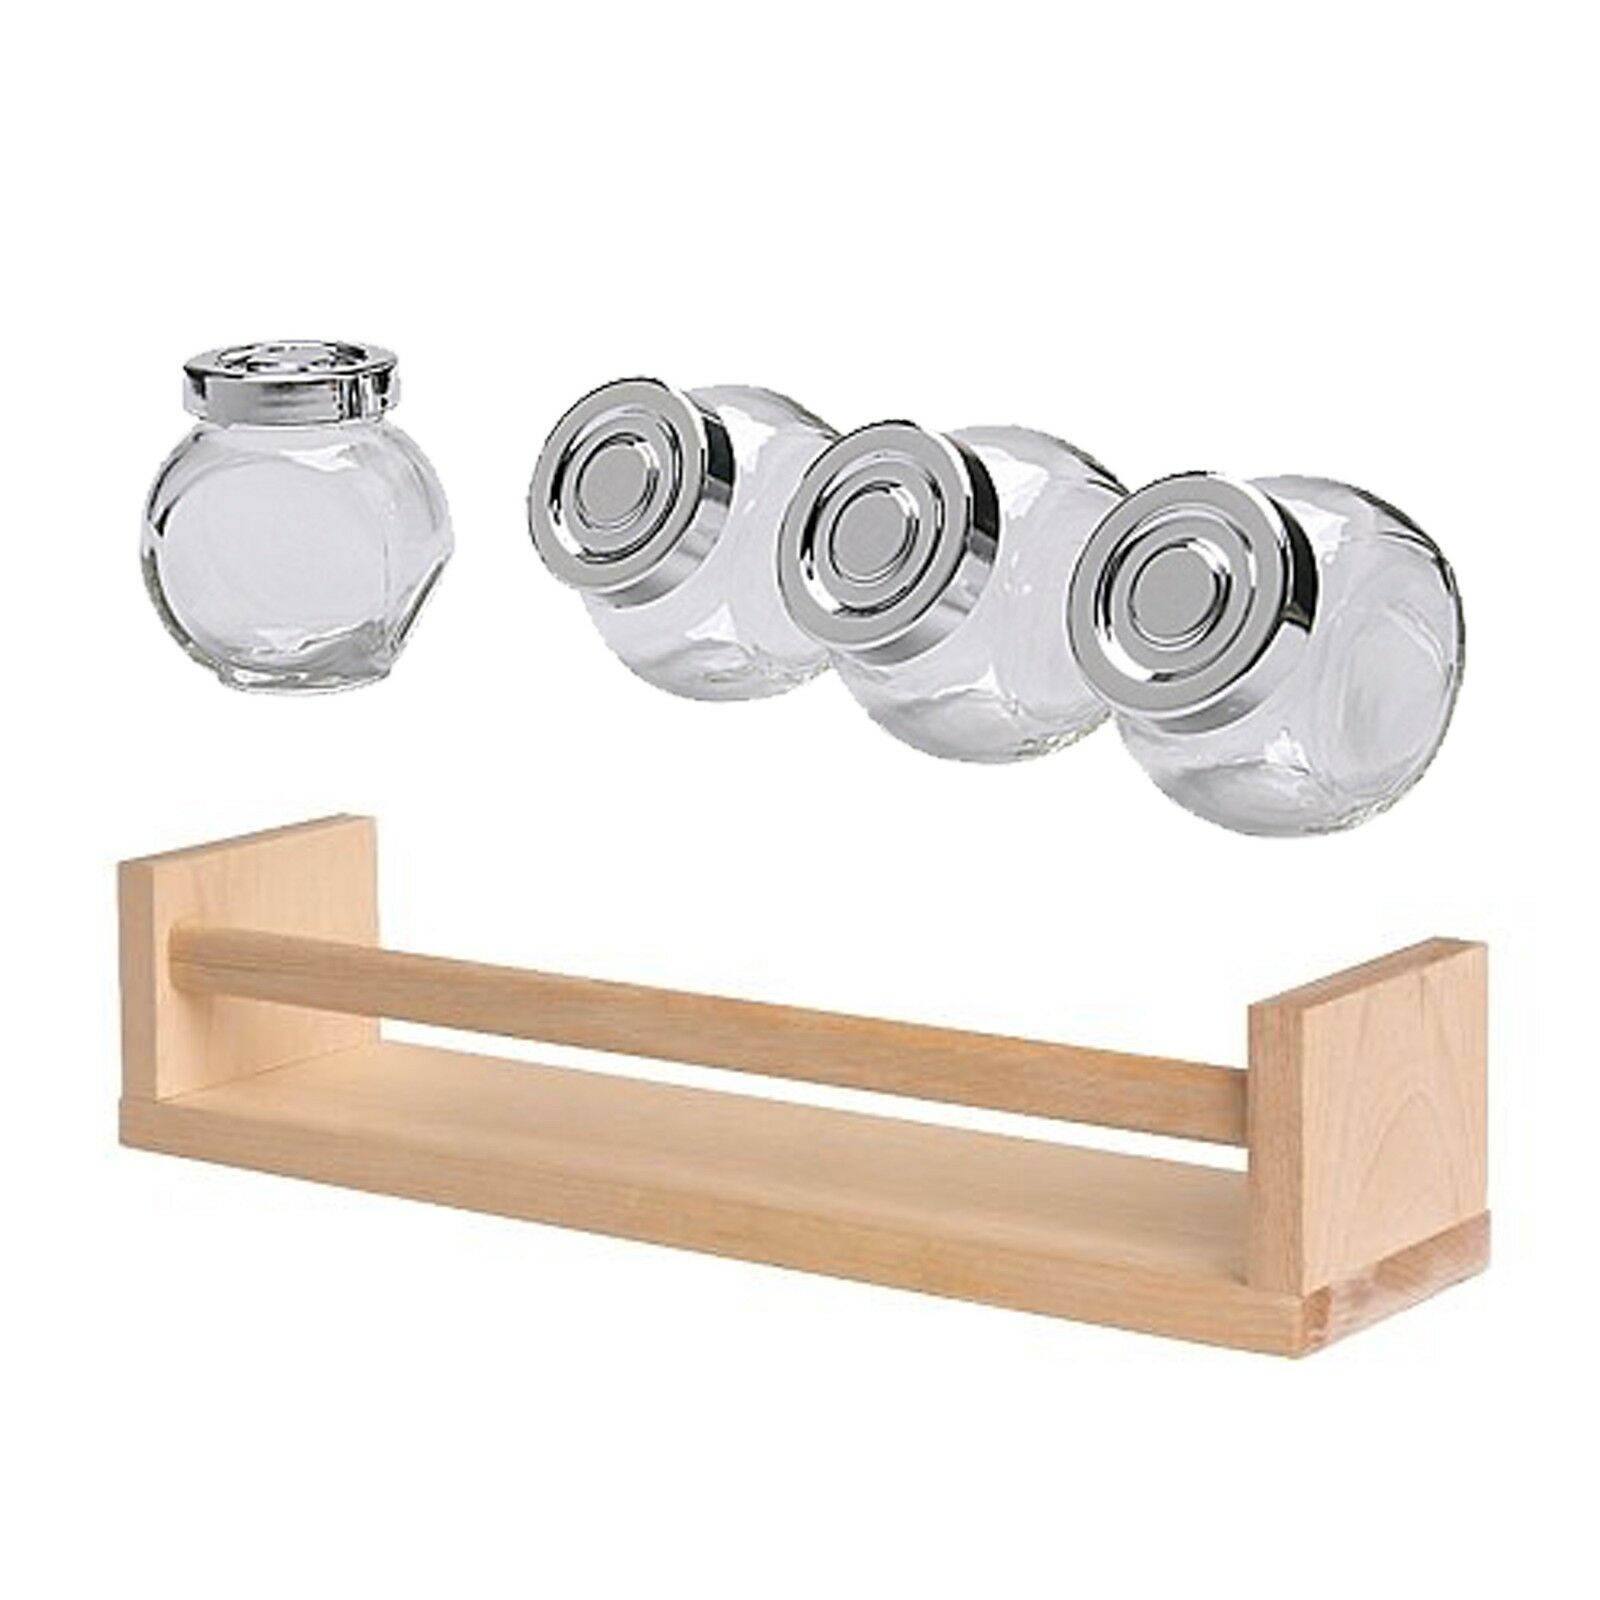 Set di 4x ikea rajtan vetro spezie vasetti 1x bekvam portaspezie in legno ebay - Ikea portaspezie bekvam ...